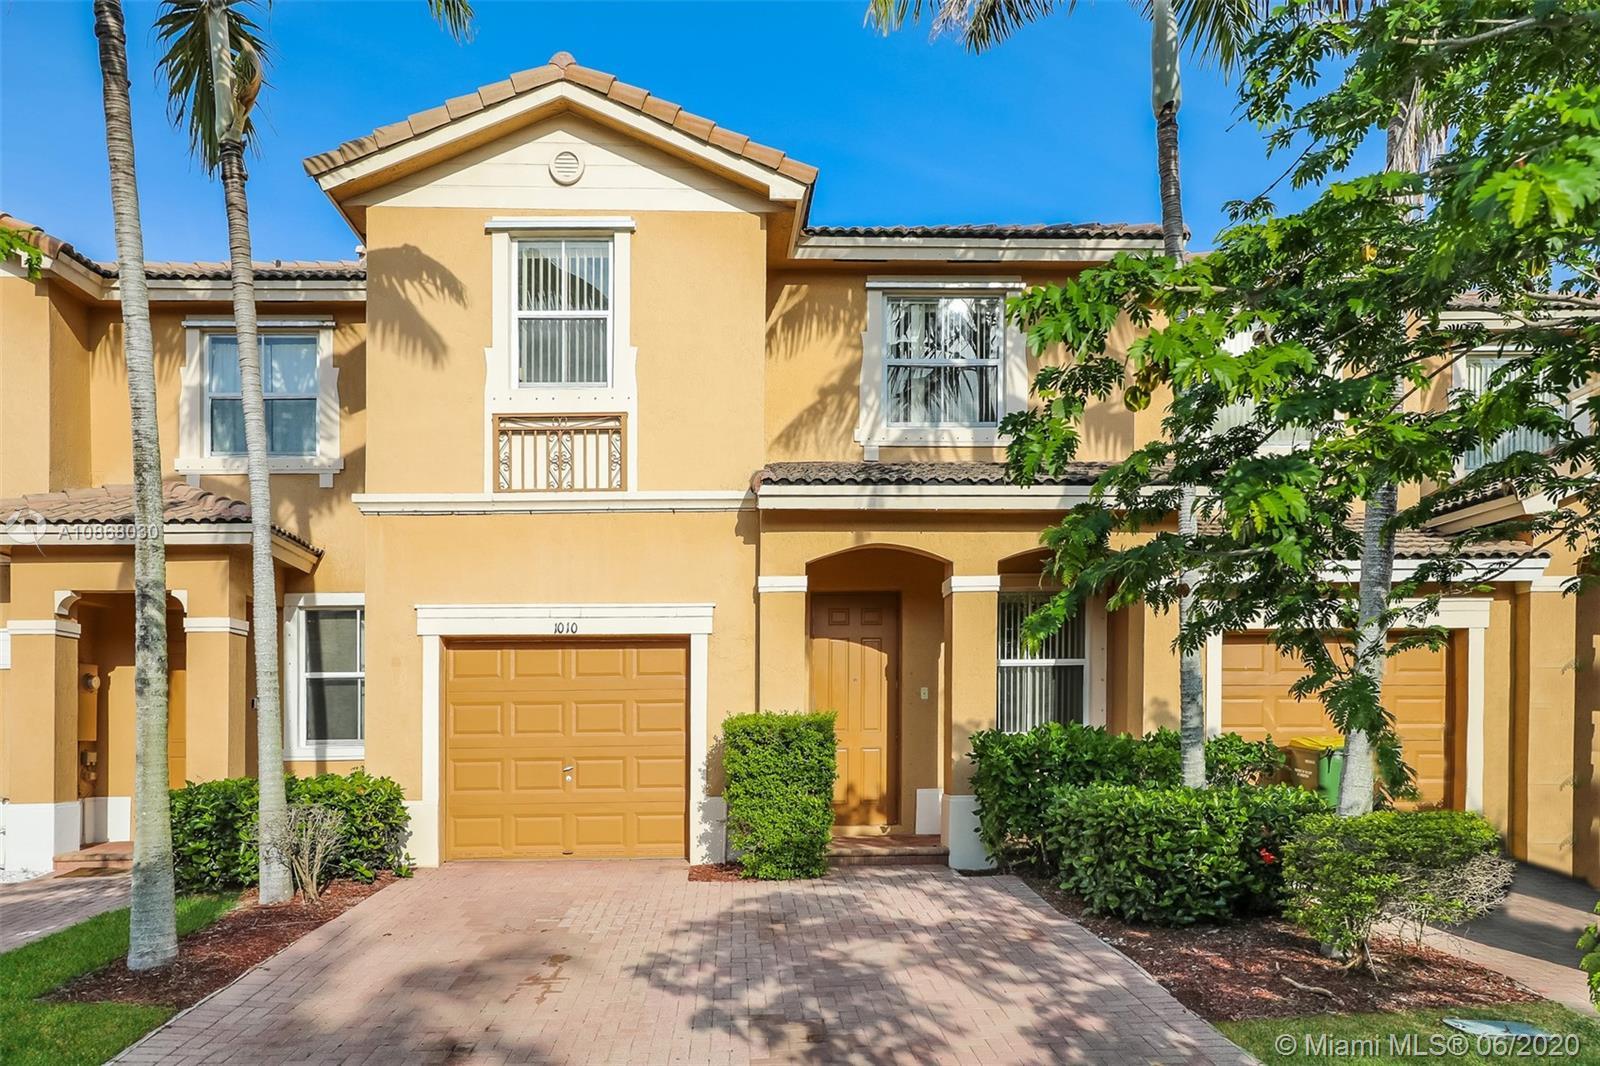 1010 NE 42nd Ave, Homestead, FL 33033 - Homestead, FL real estate listing